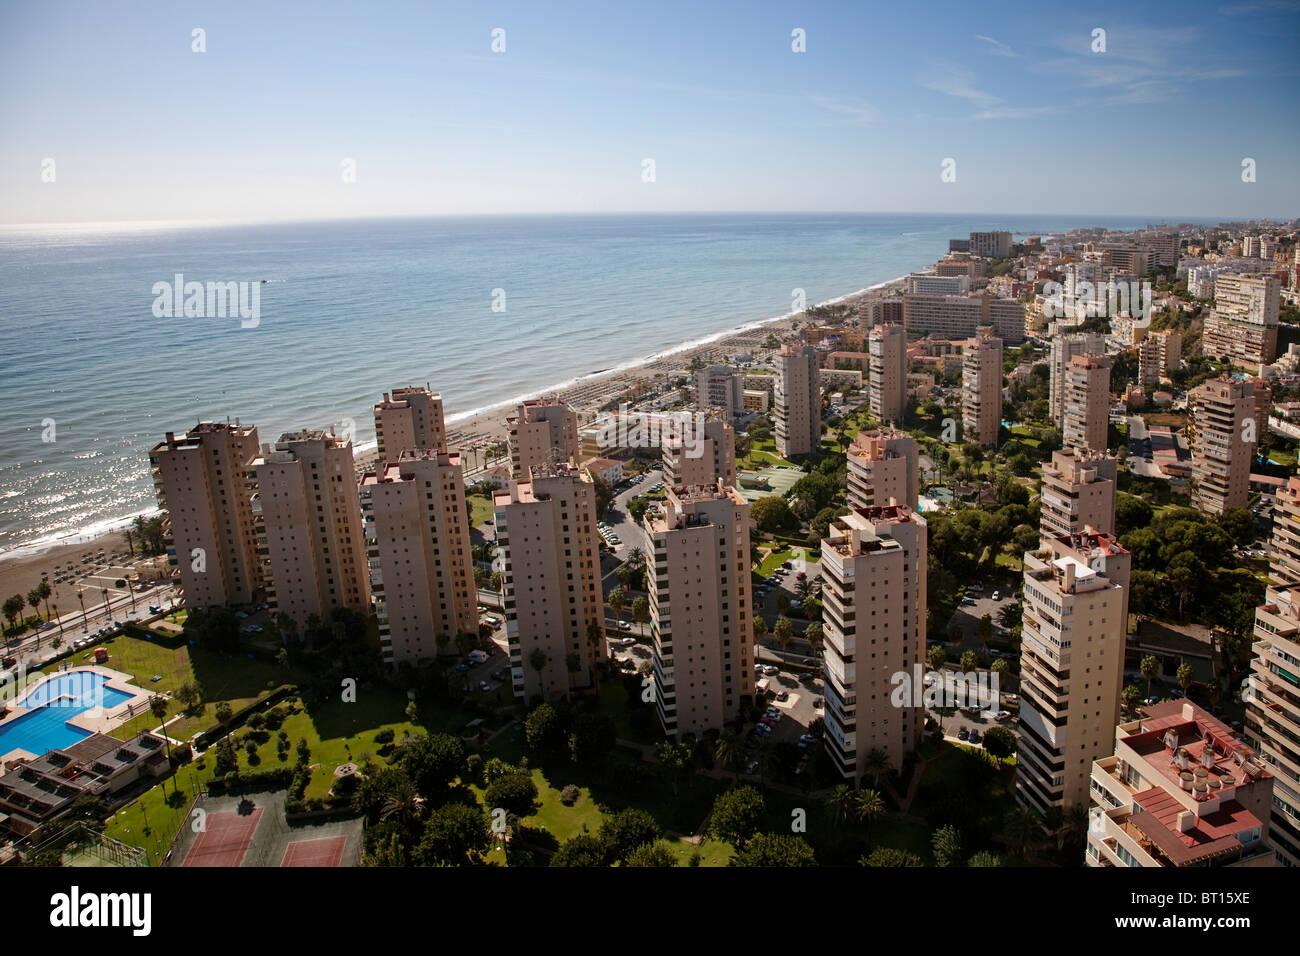 Vista aerea torremolinos m laga costa del sol andaluc a - Fotografia aerea malaga ...